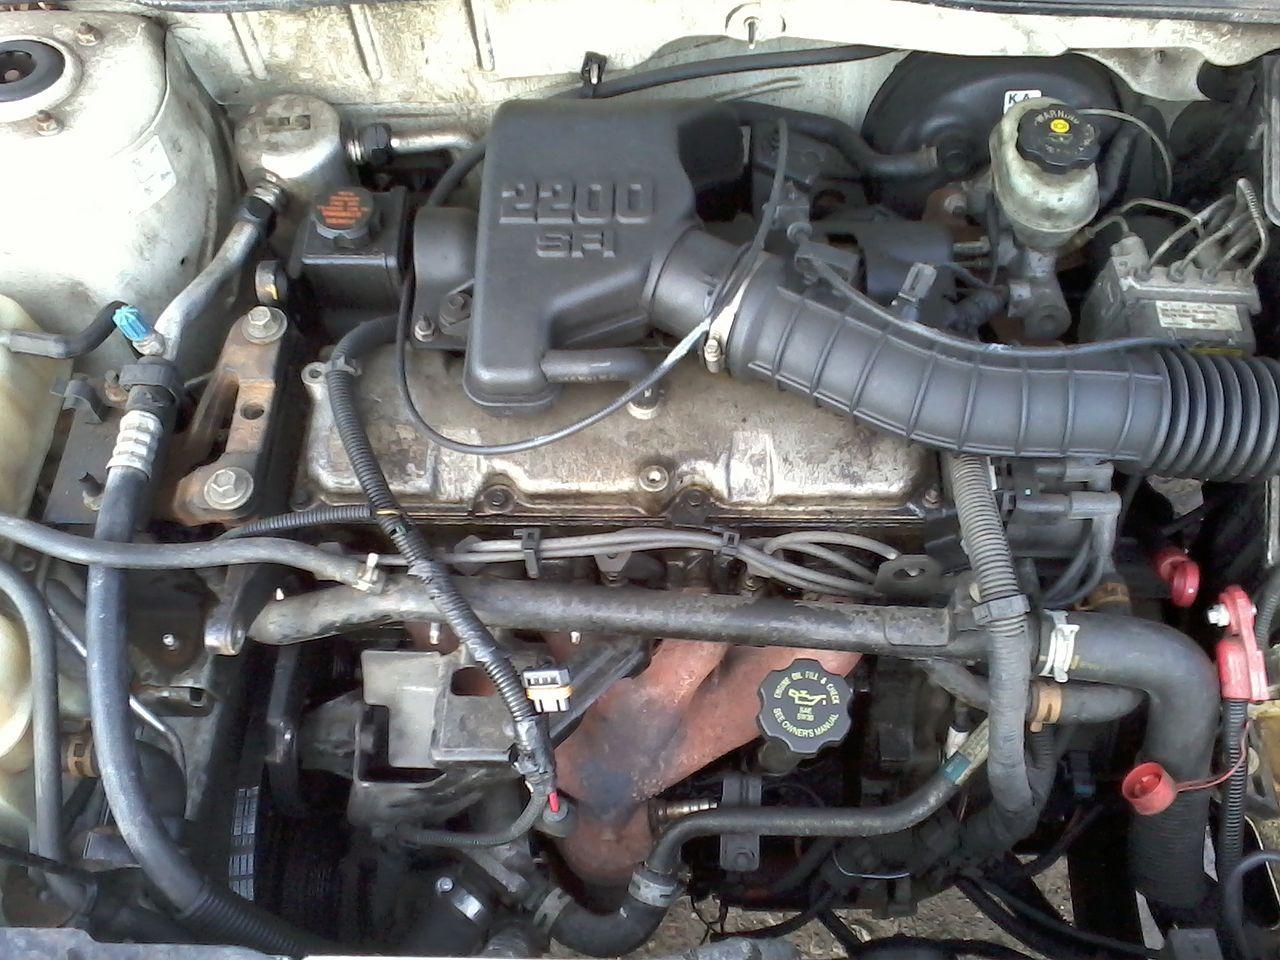 LZ_0840] Chevy S10 2 Engine Diagram Free DiagramStrai Iness Rimen Gram Amenti Inoma Nful Mohammedshrine Librar Wiring 101